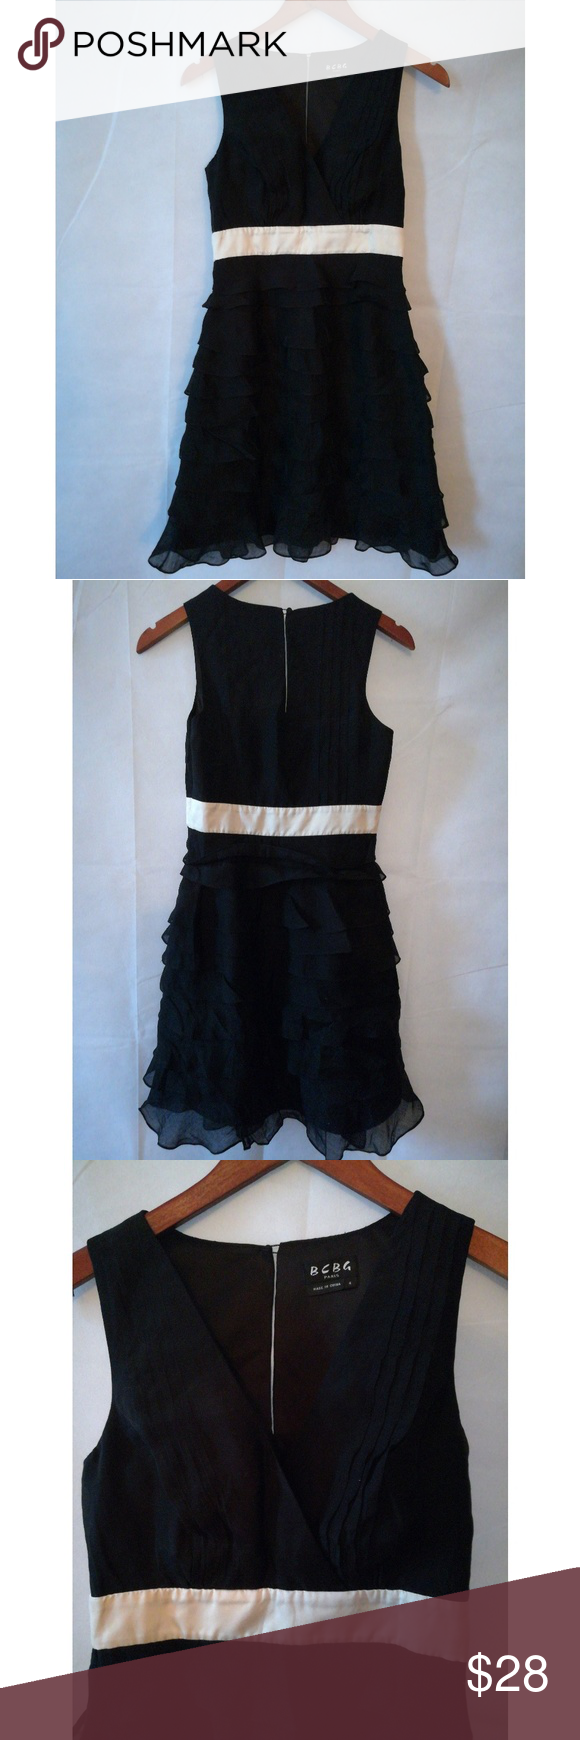 Bcbg Black Ruffled Dress Size 4 Bcbg Beautiful Black Dress Sleeveless With Sheer Ruffles On Bottom Black Ruffle Dress Beautiful Black Dresses Ruffle Dress [ 1740 x 580 Pixel ]